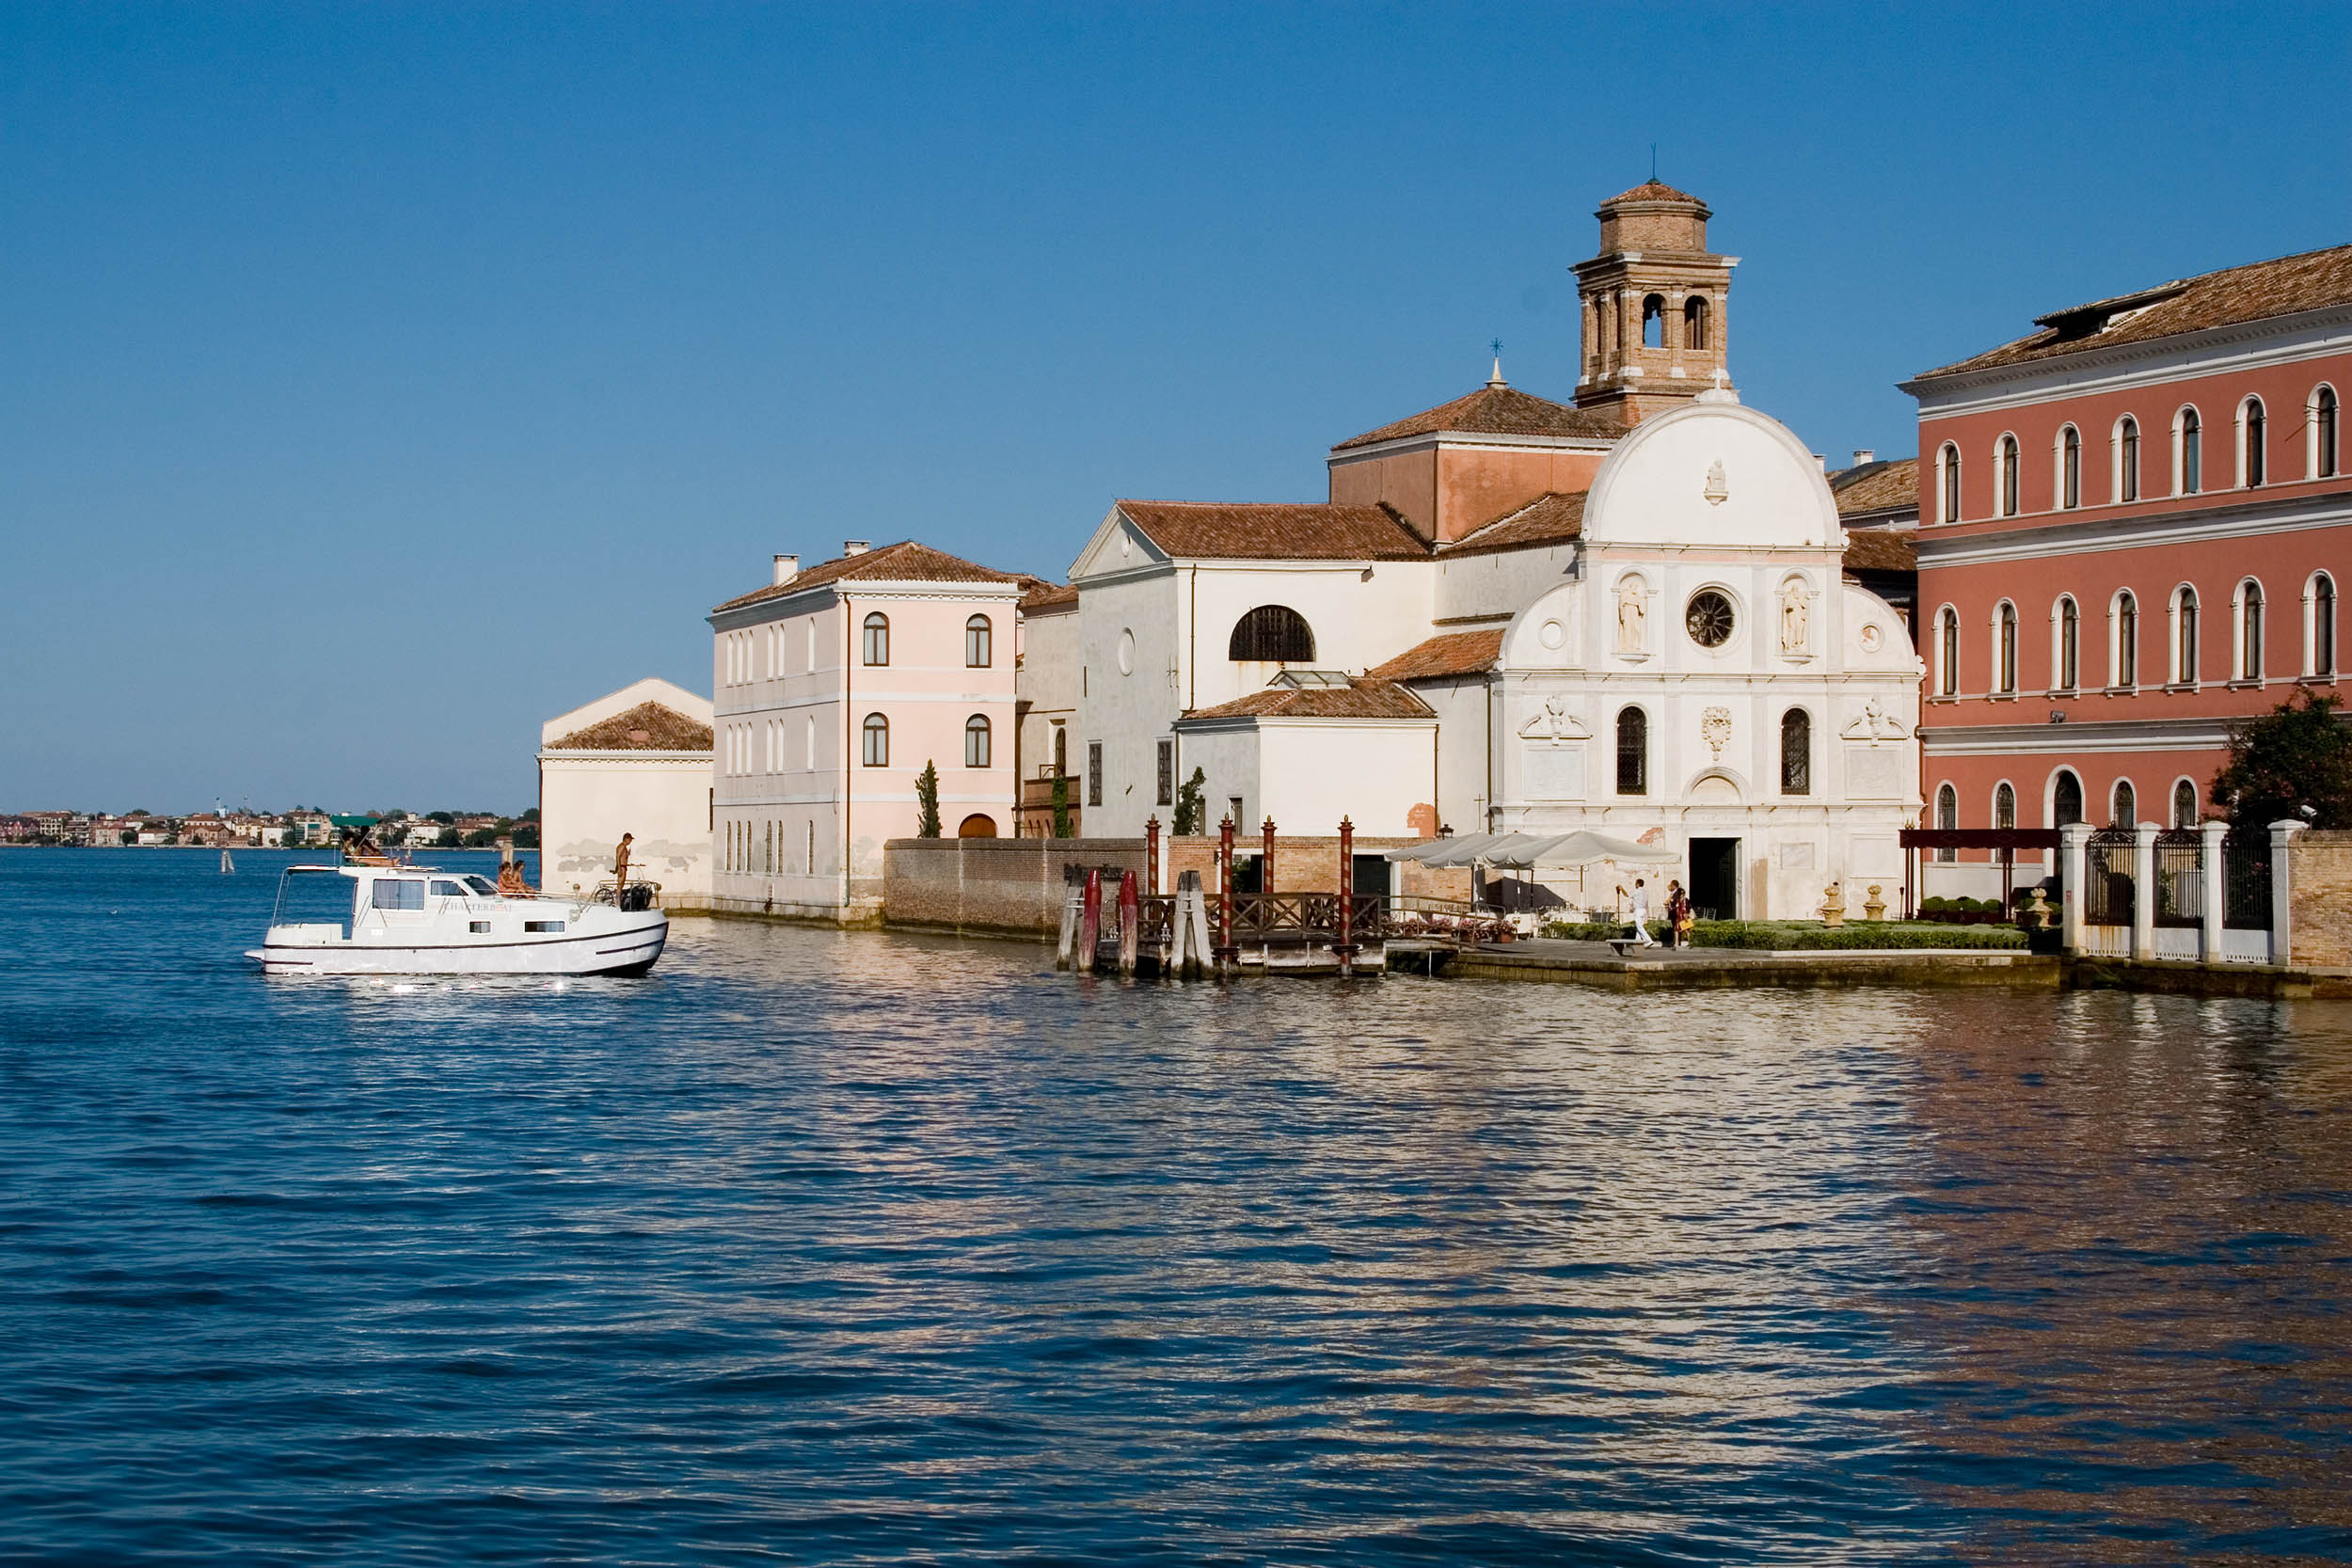 Hausboote Venedig Lagune San Servolo Bugstrahlruder